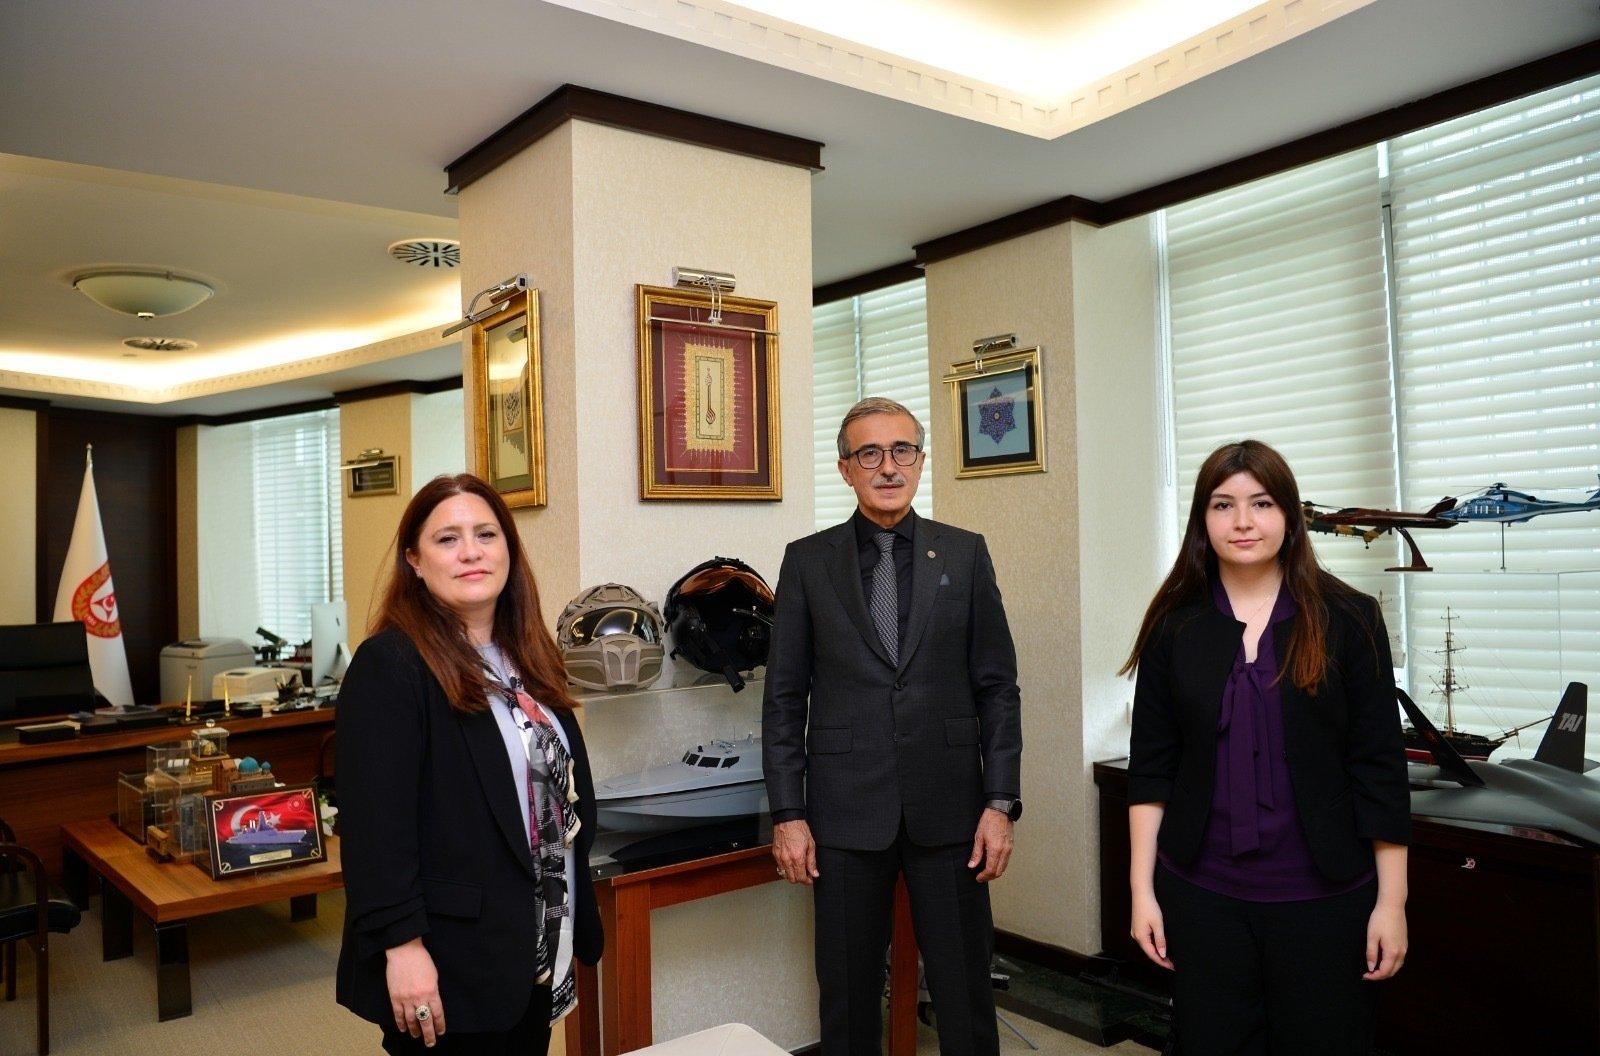 Presidency of Defense Industries (SSB) Chairperson Ismail Demir with Daily Sabah Ankara Representative Nur Özkan Erbay and Daily Sabah's Dilara Aslan at the SSB in Ankara, Turkey, June 24, 2021. (Courtesy of the SSB)